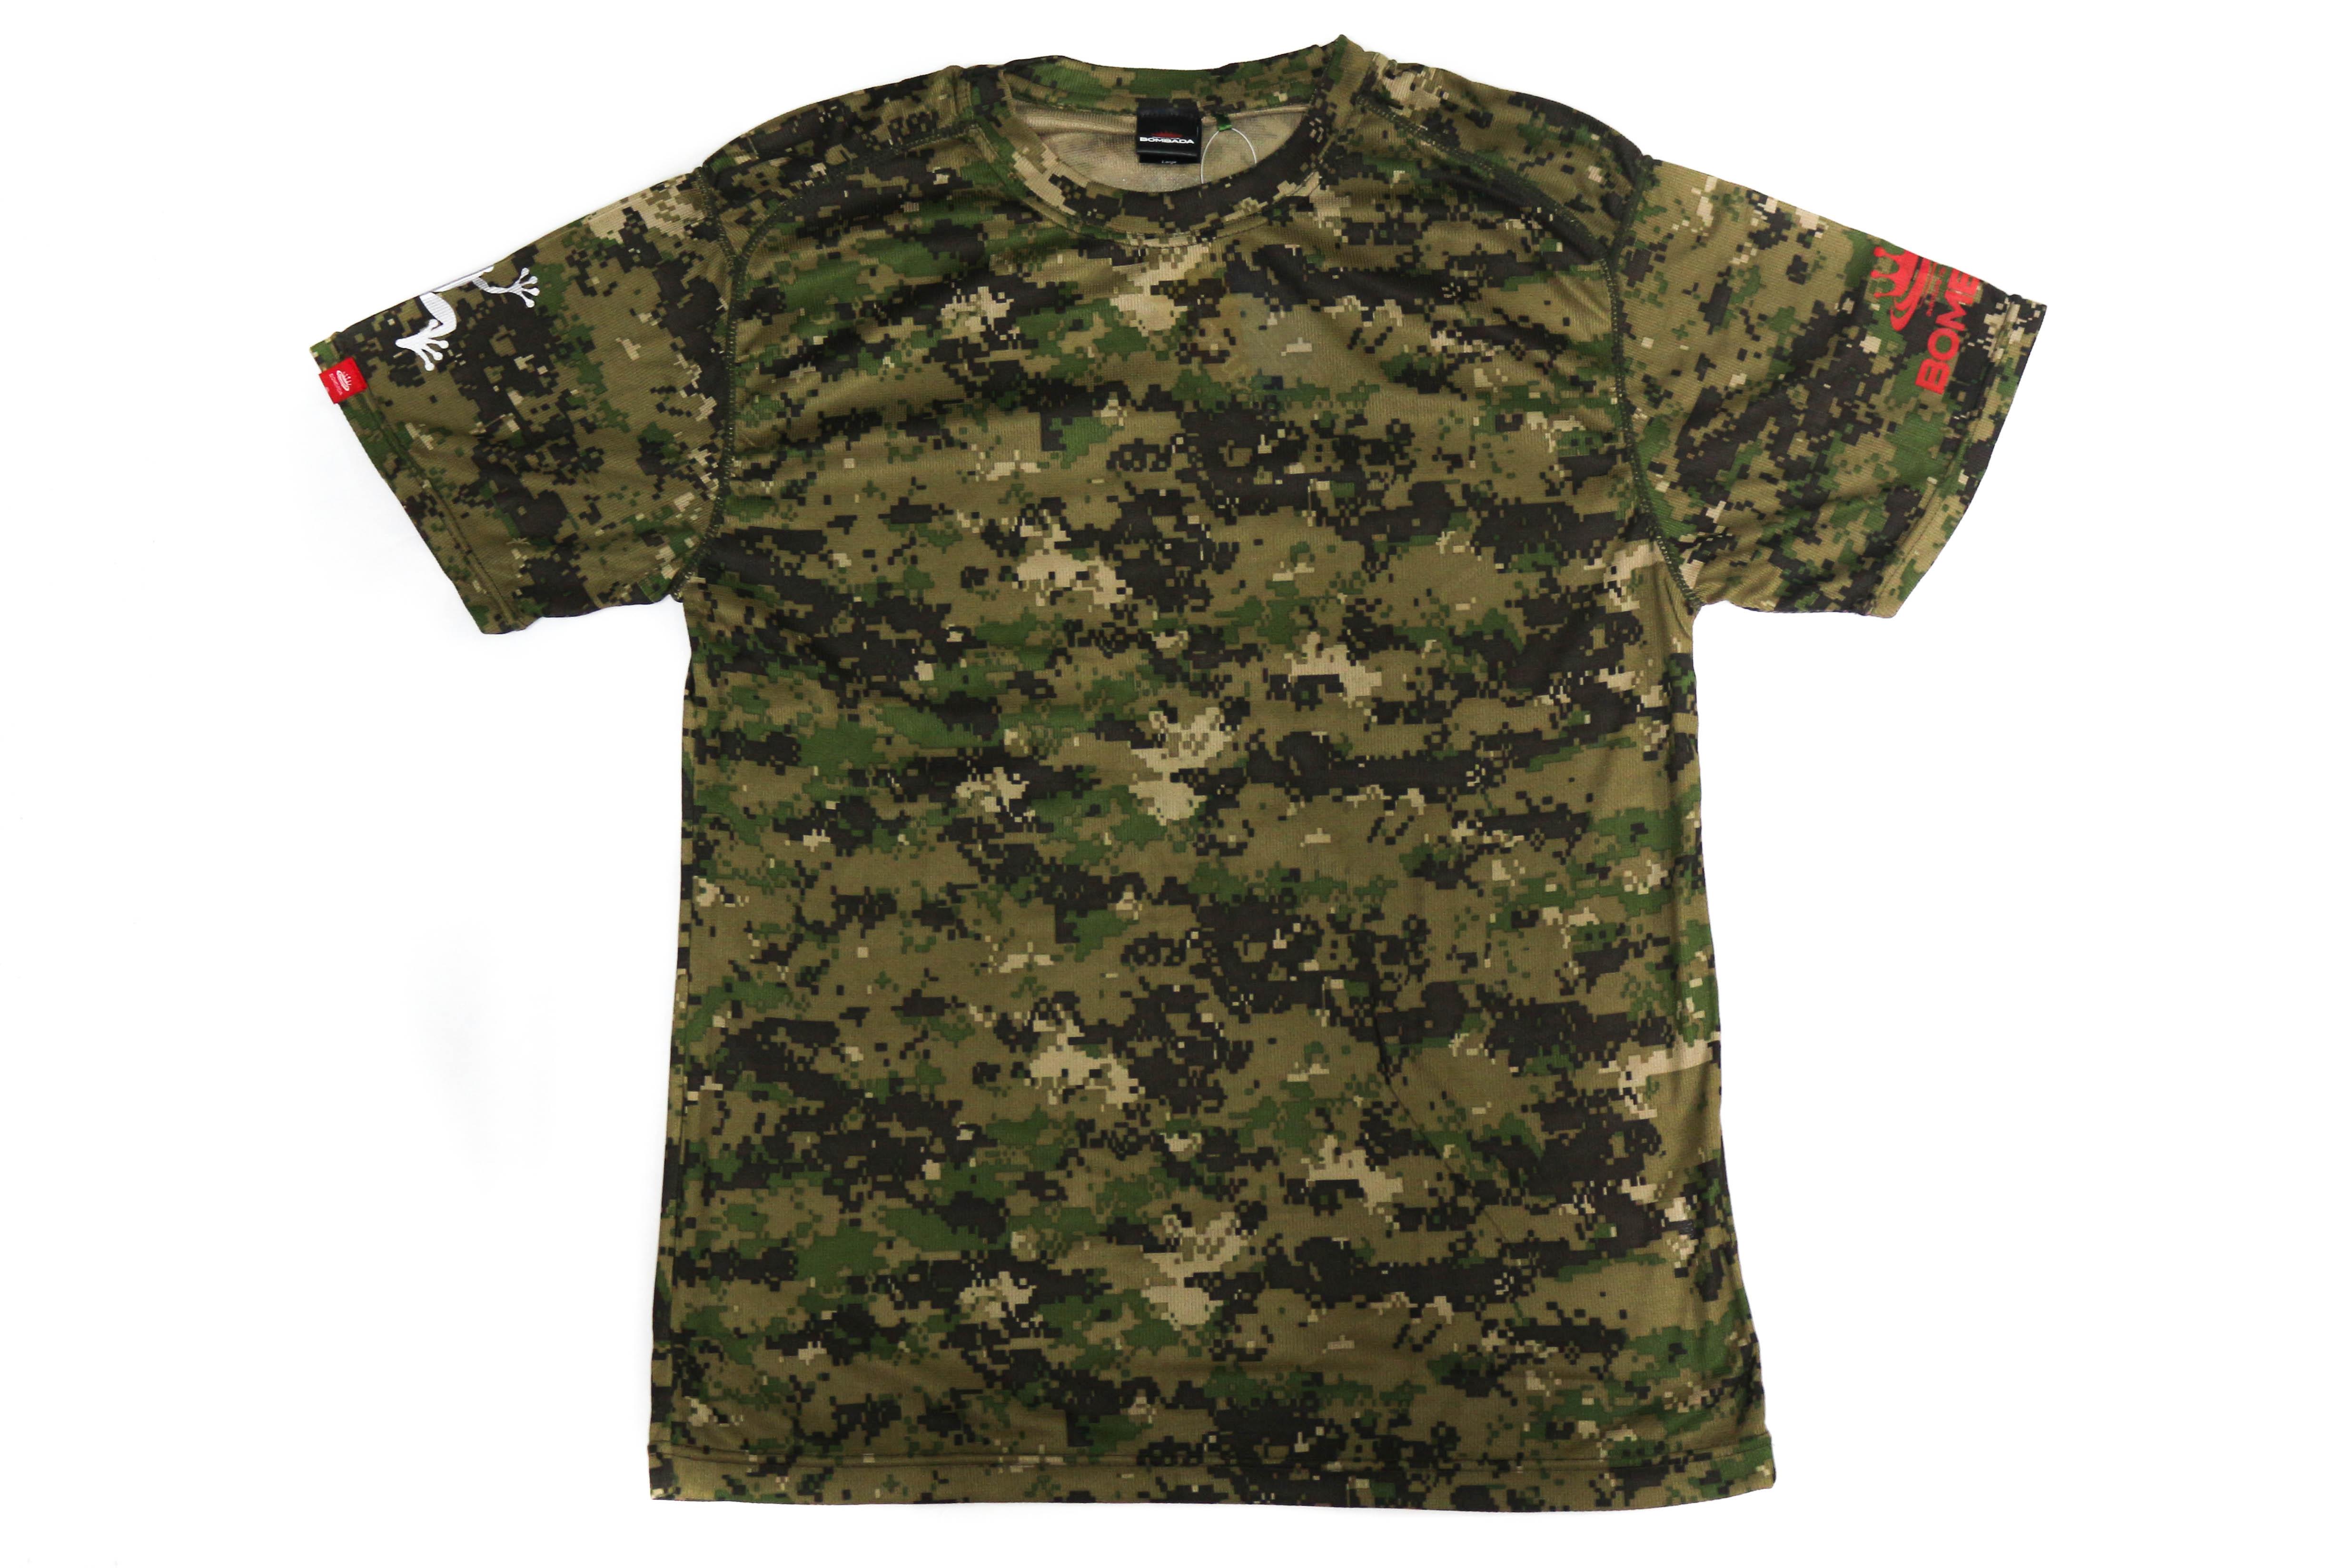 Sale Bombada T-Shirt Giant Snakehead Dry Fit Short Sleeve Size L Woodland (4103)